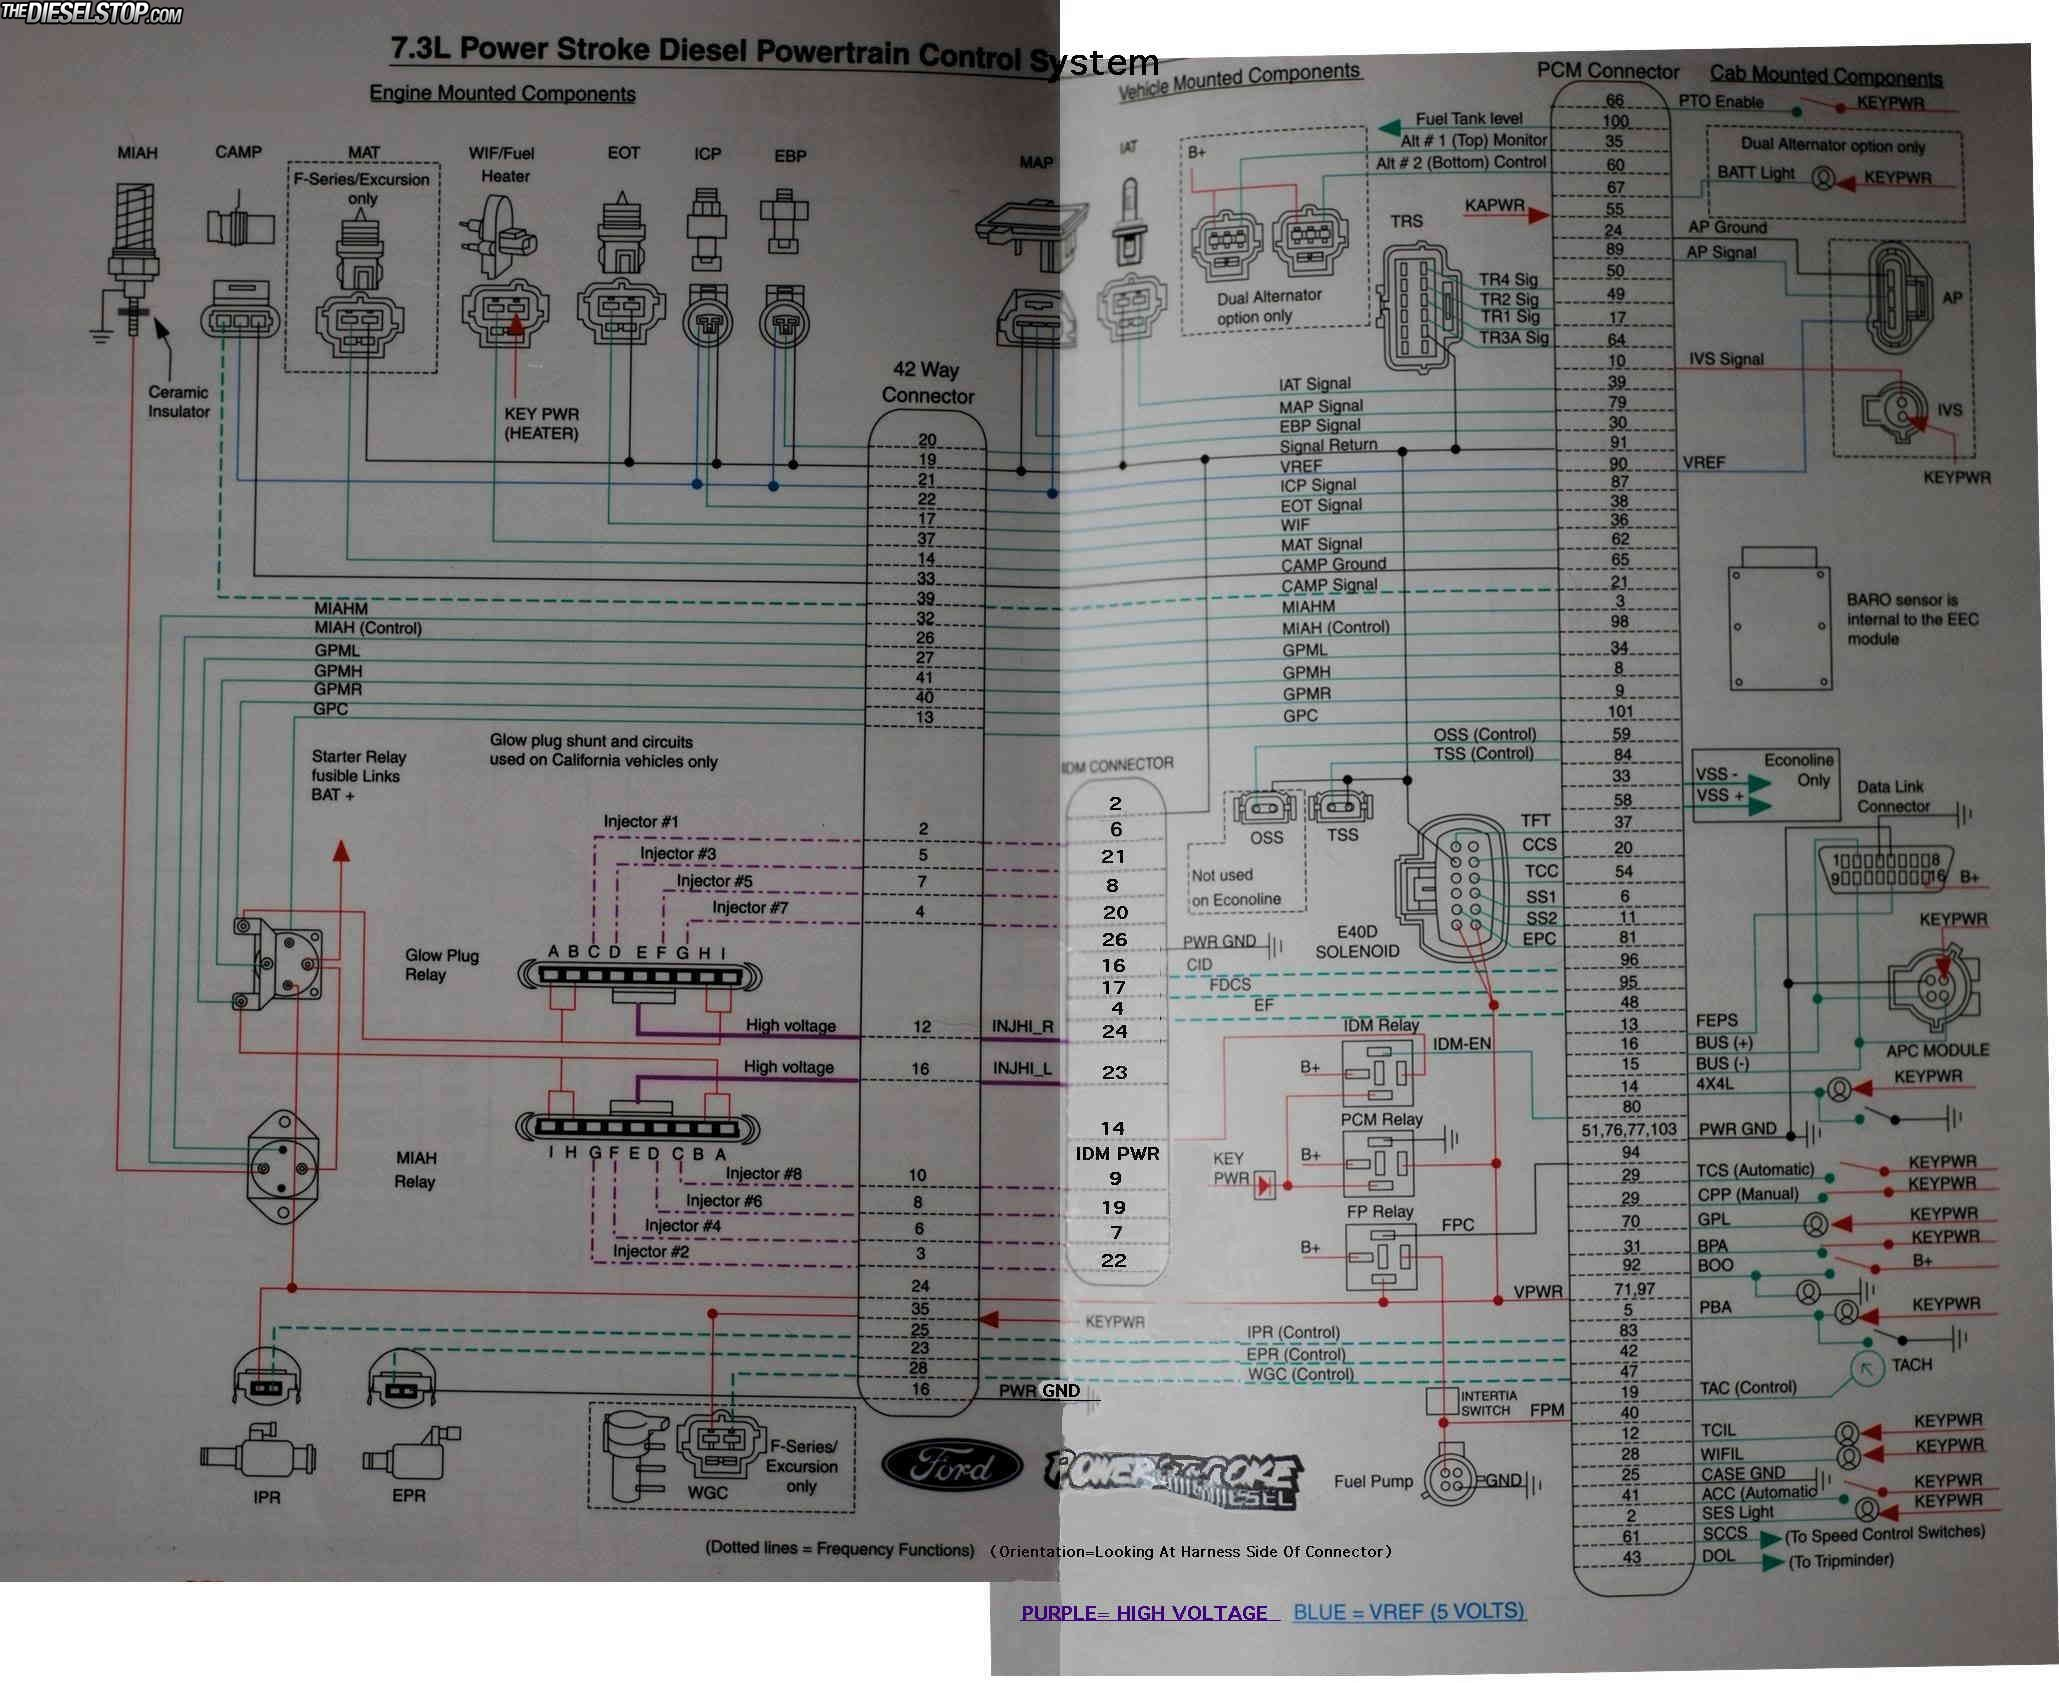 WRG-9424] 7 3 sel Engine Diagram on